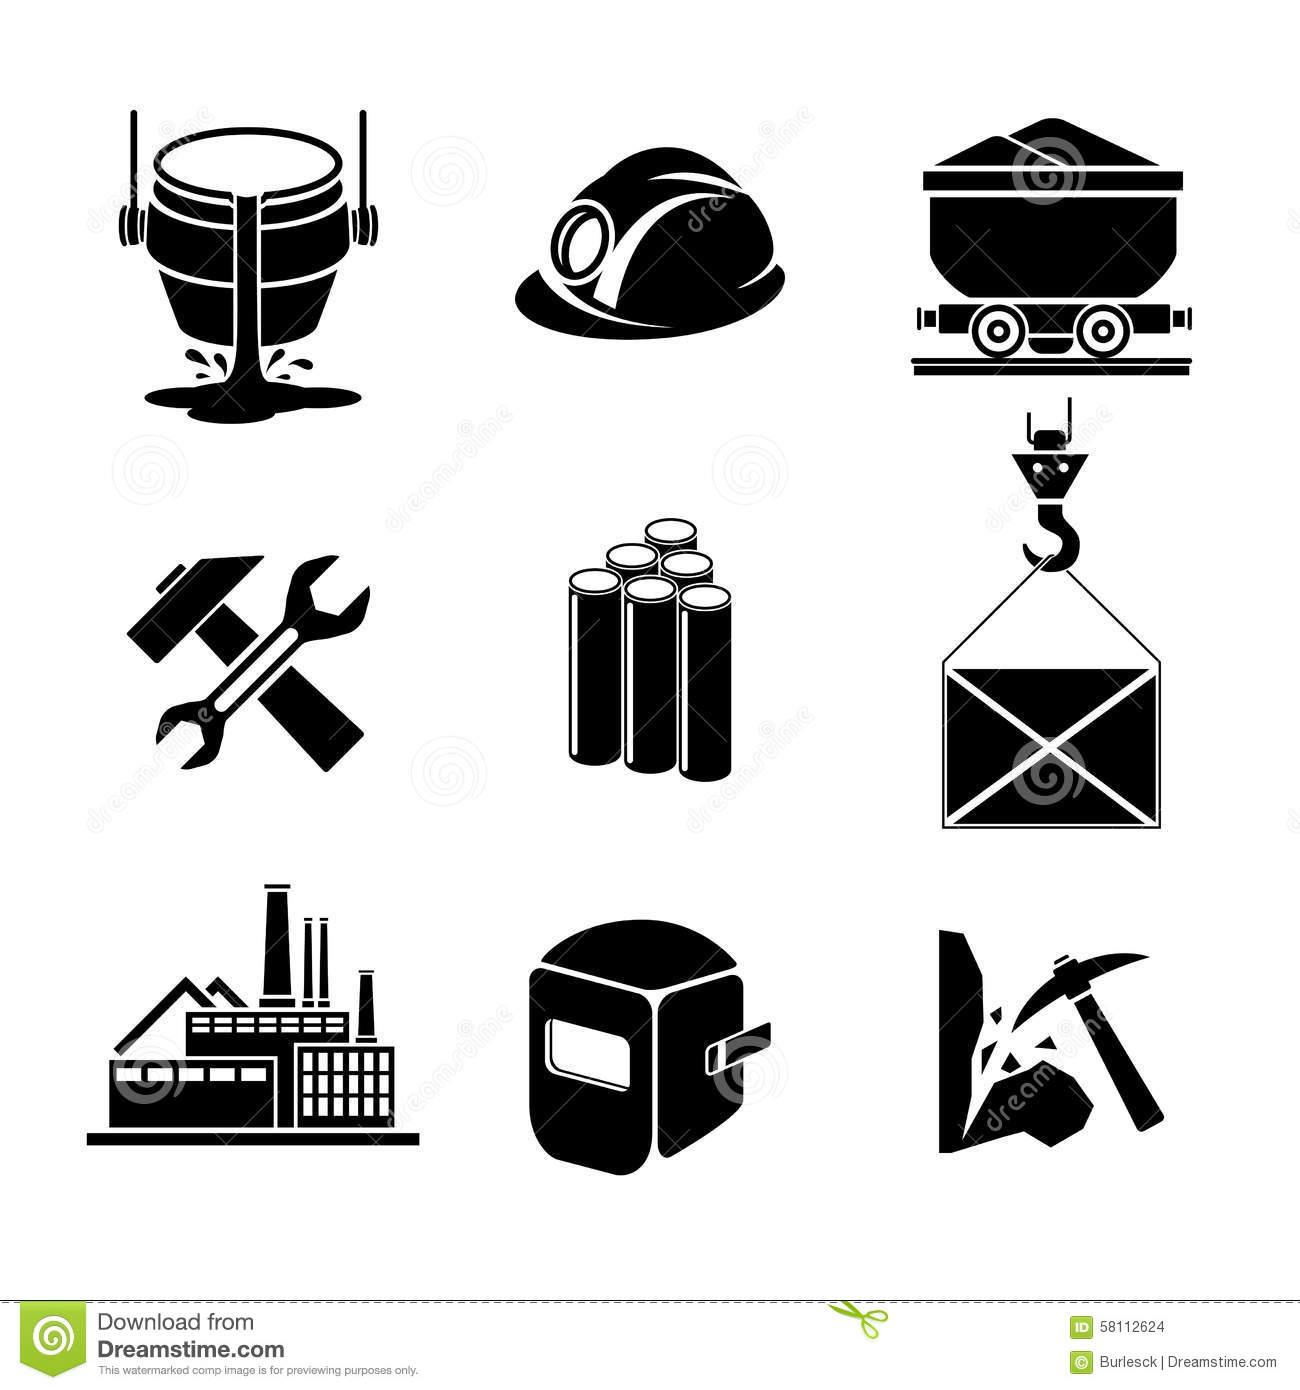 Foundry Stock Illustrations.